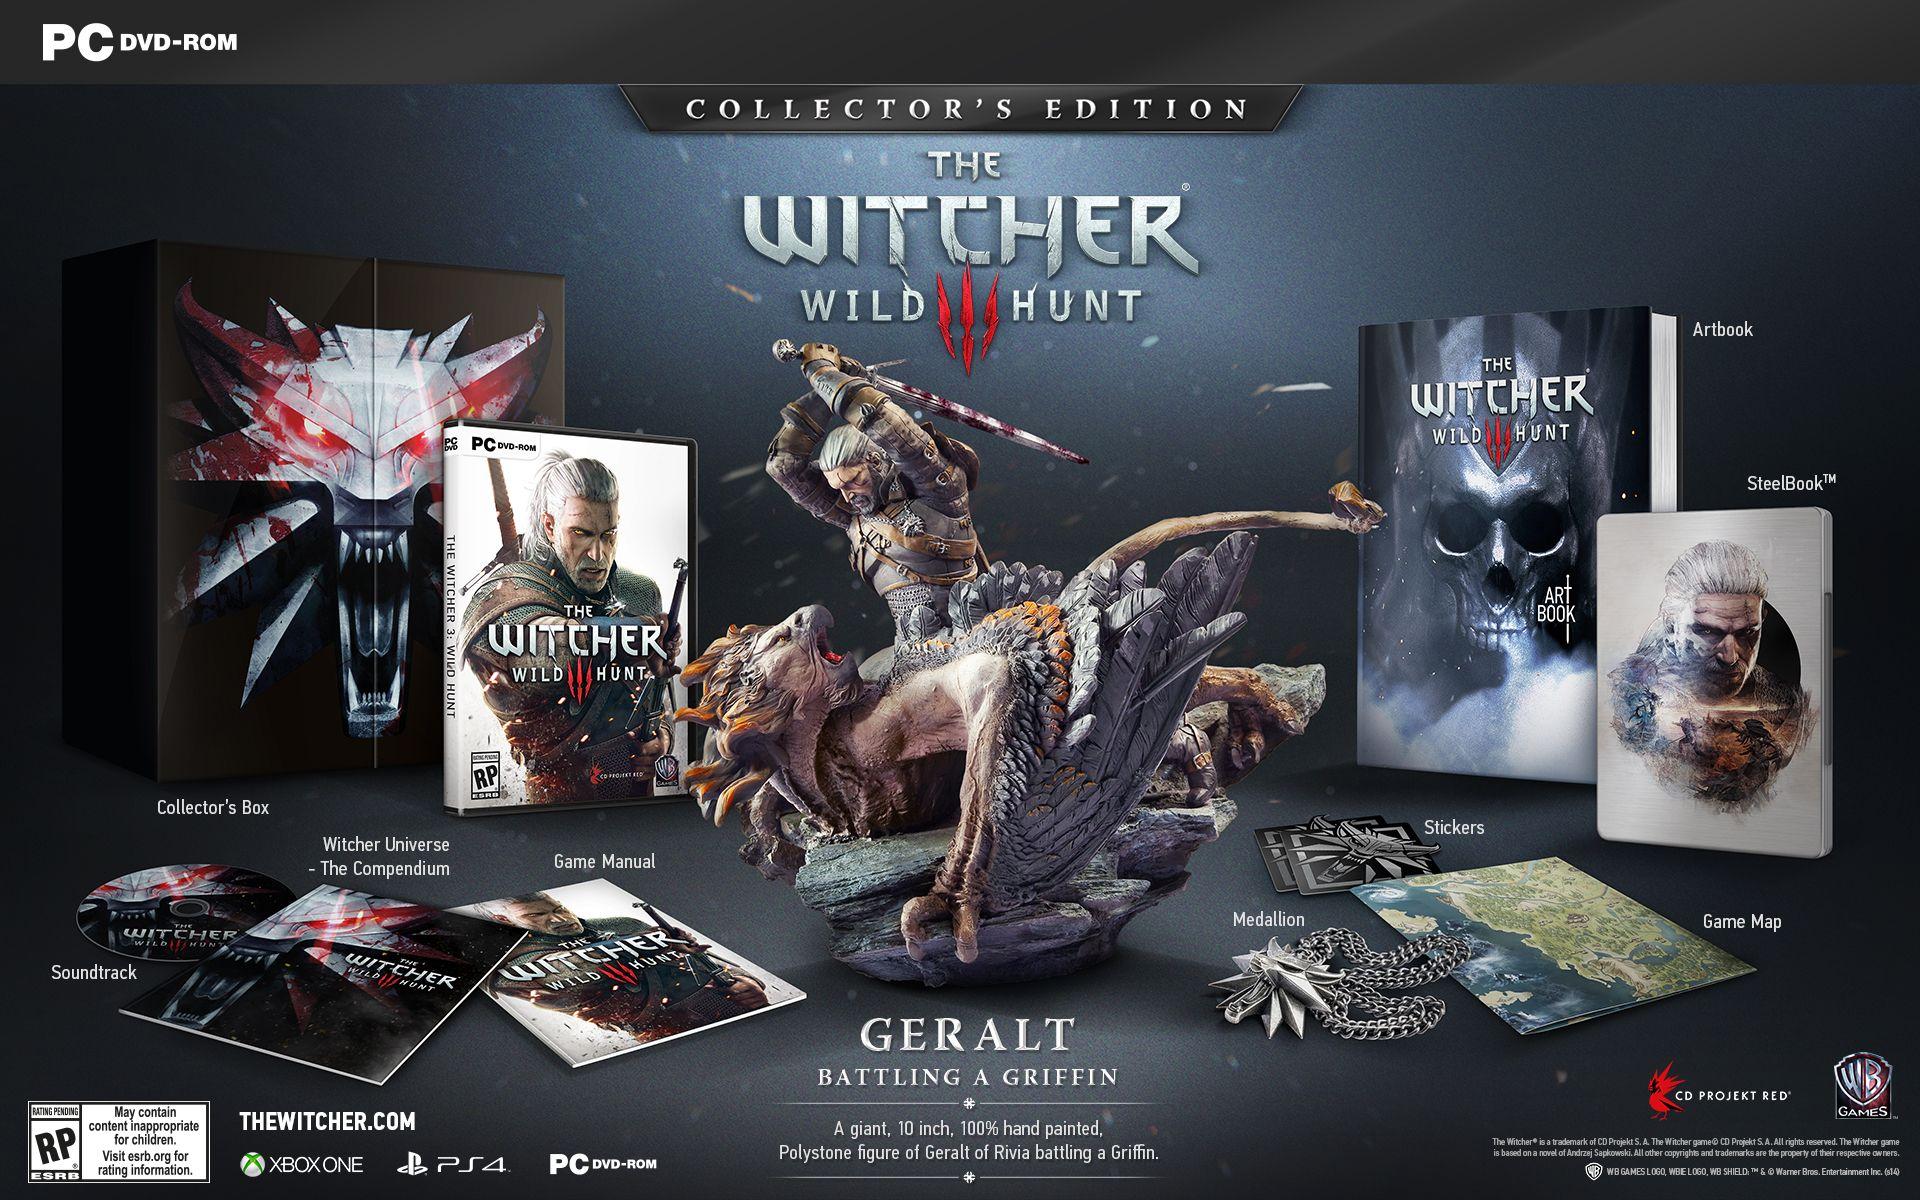 [E3 14] Grandes noticias sobre The Witcher 3 Ifot